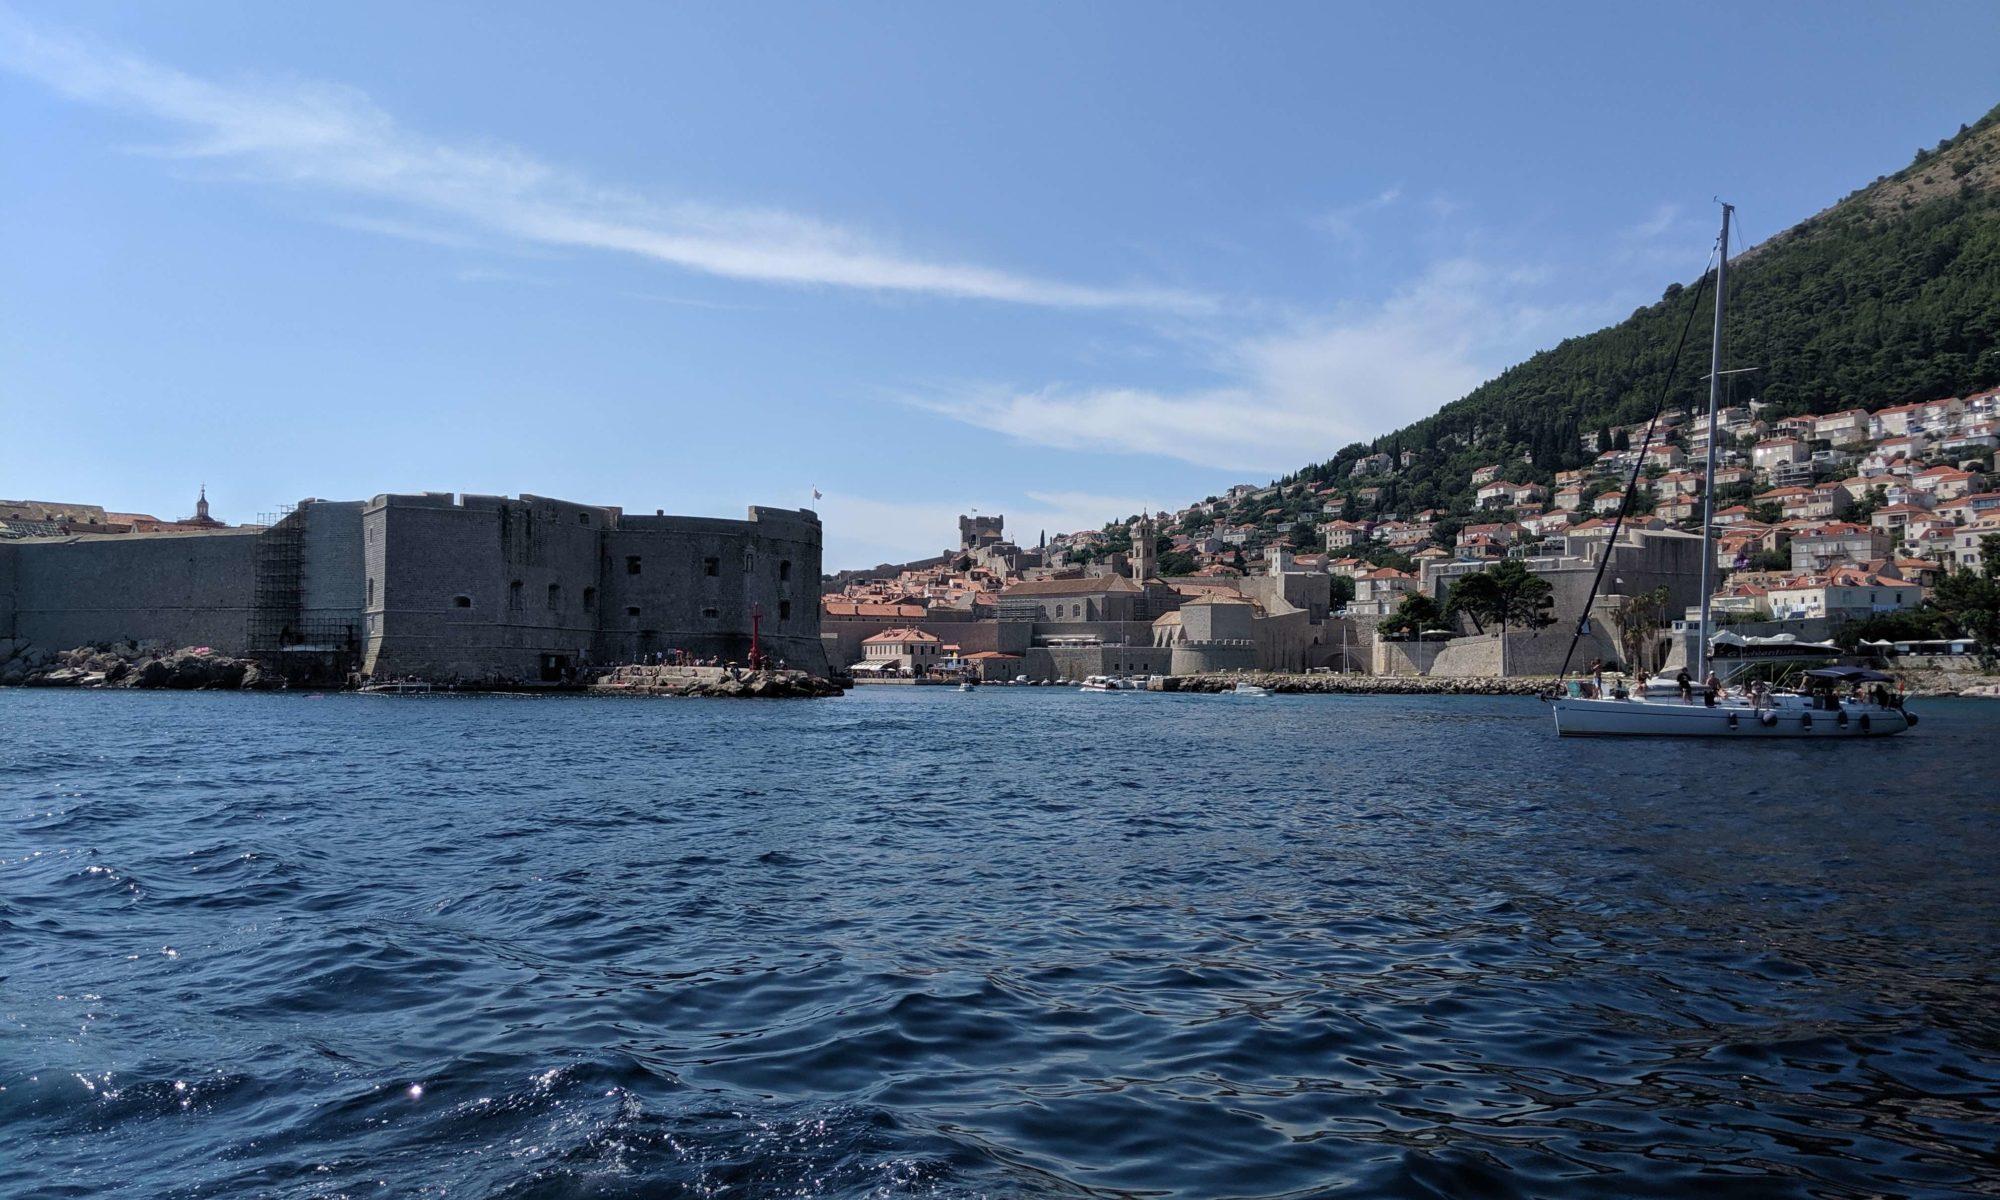 Dubrovnik Harbor as seen from Sea Rose as we motor past